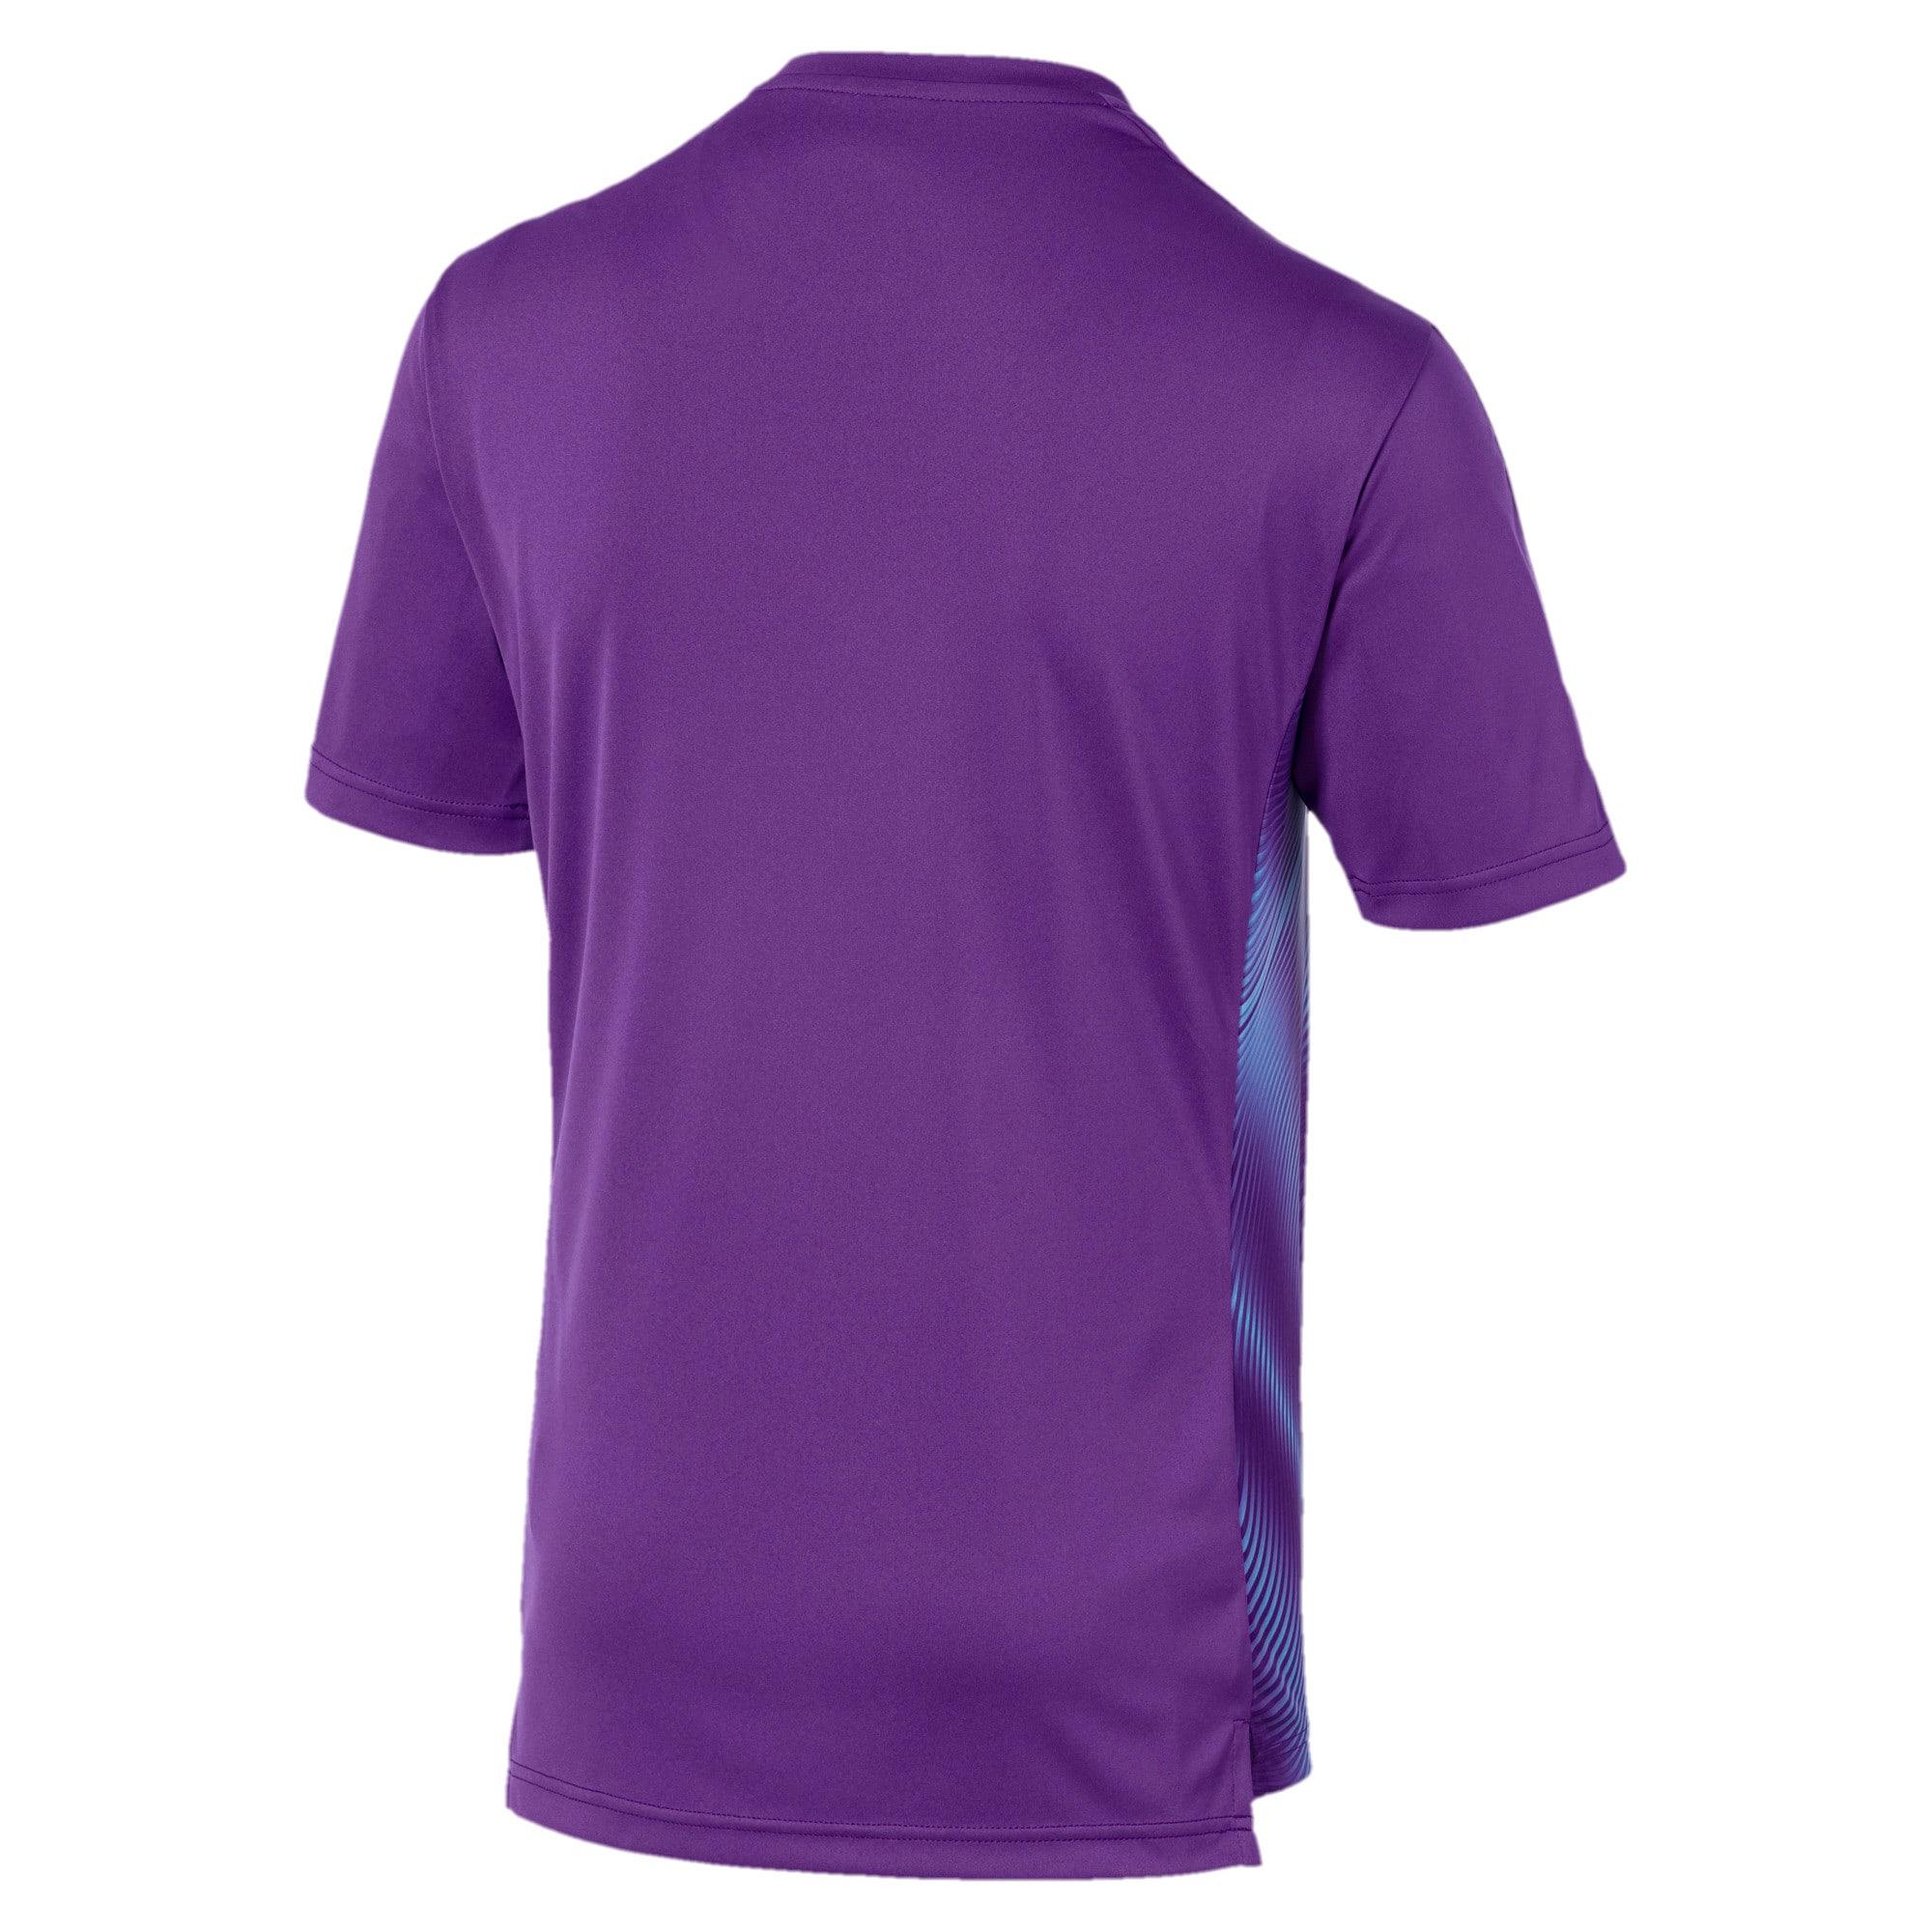 Imagen en miniatura 2 de Camiseta de hombre Stadium League Man City, TillandsiaPurple-TeamLightBl, mediana